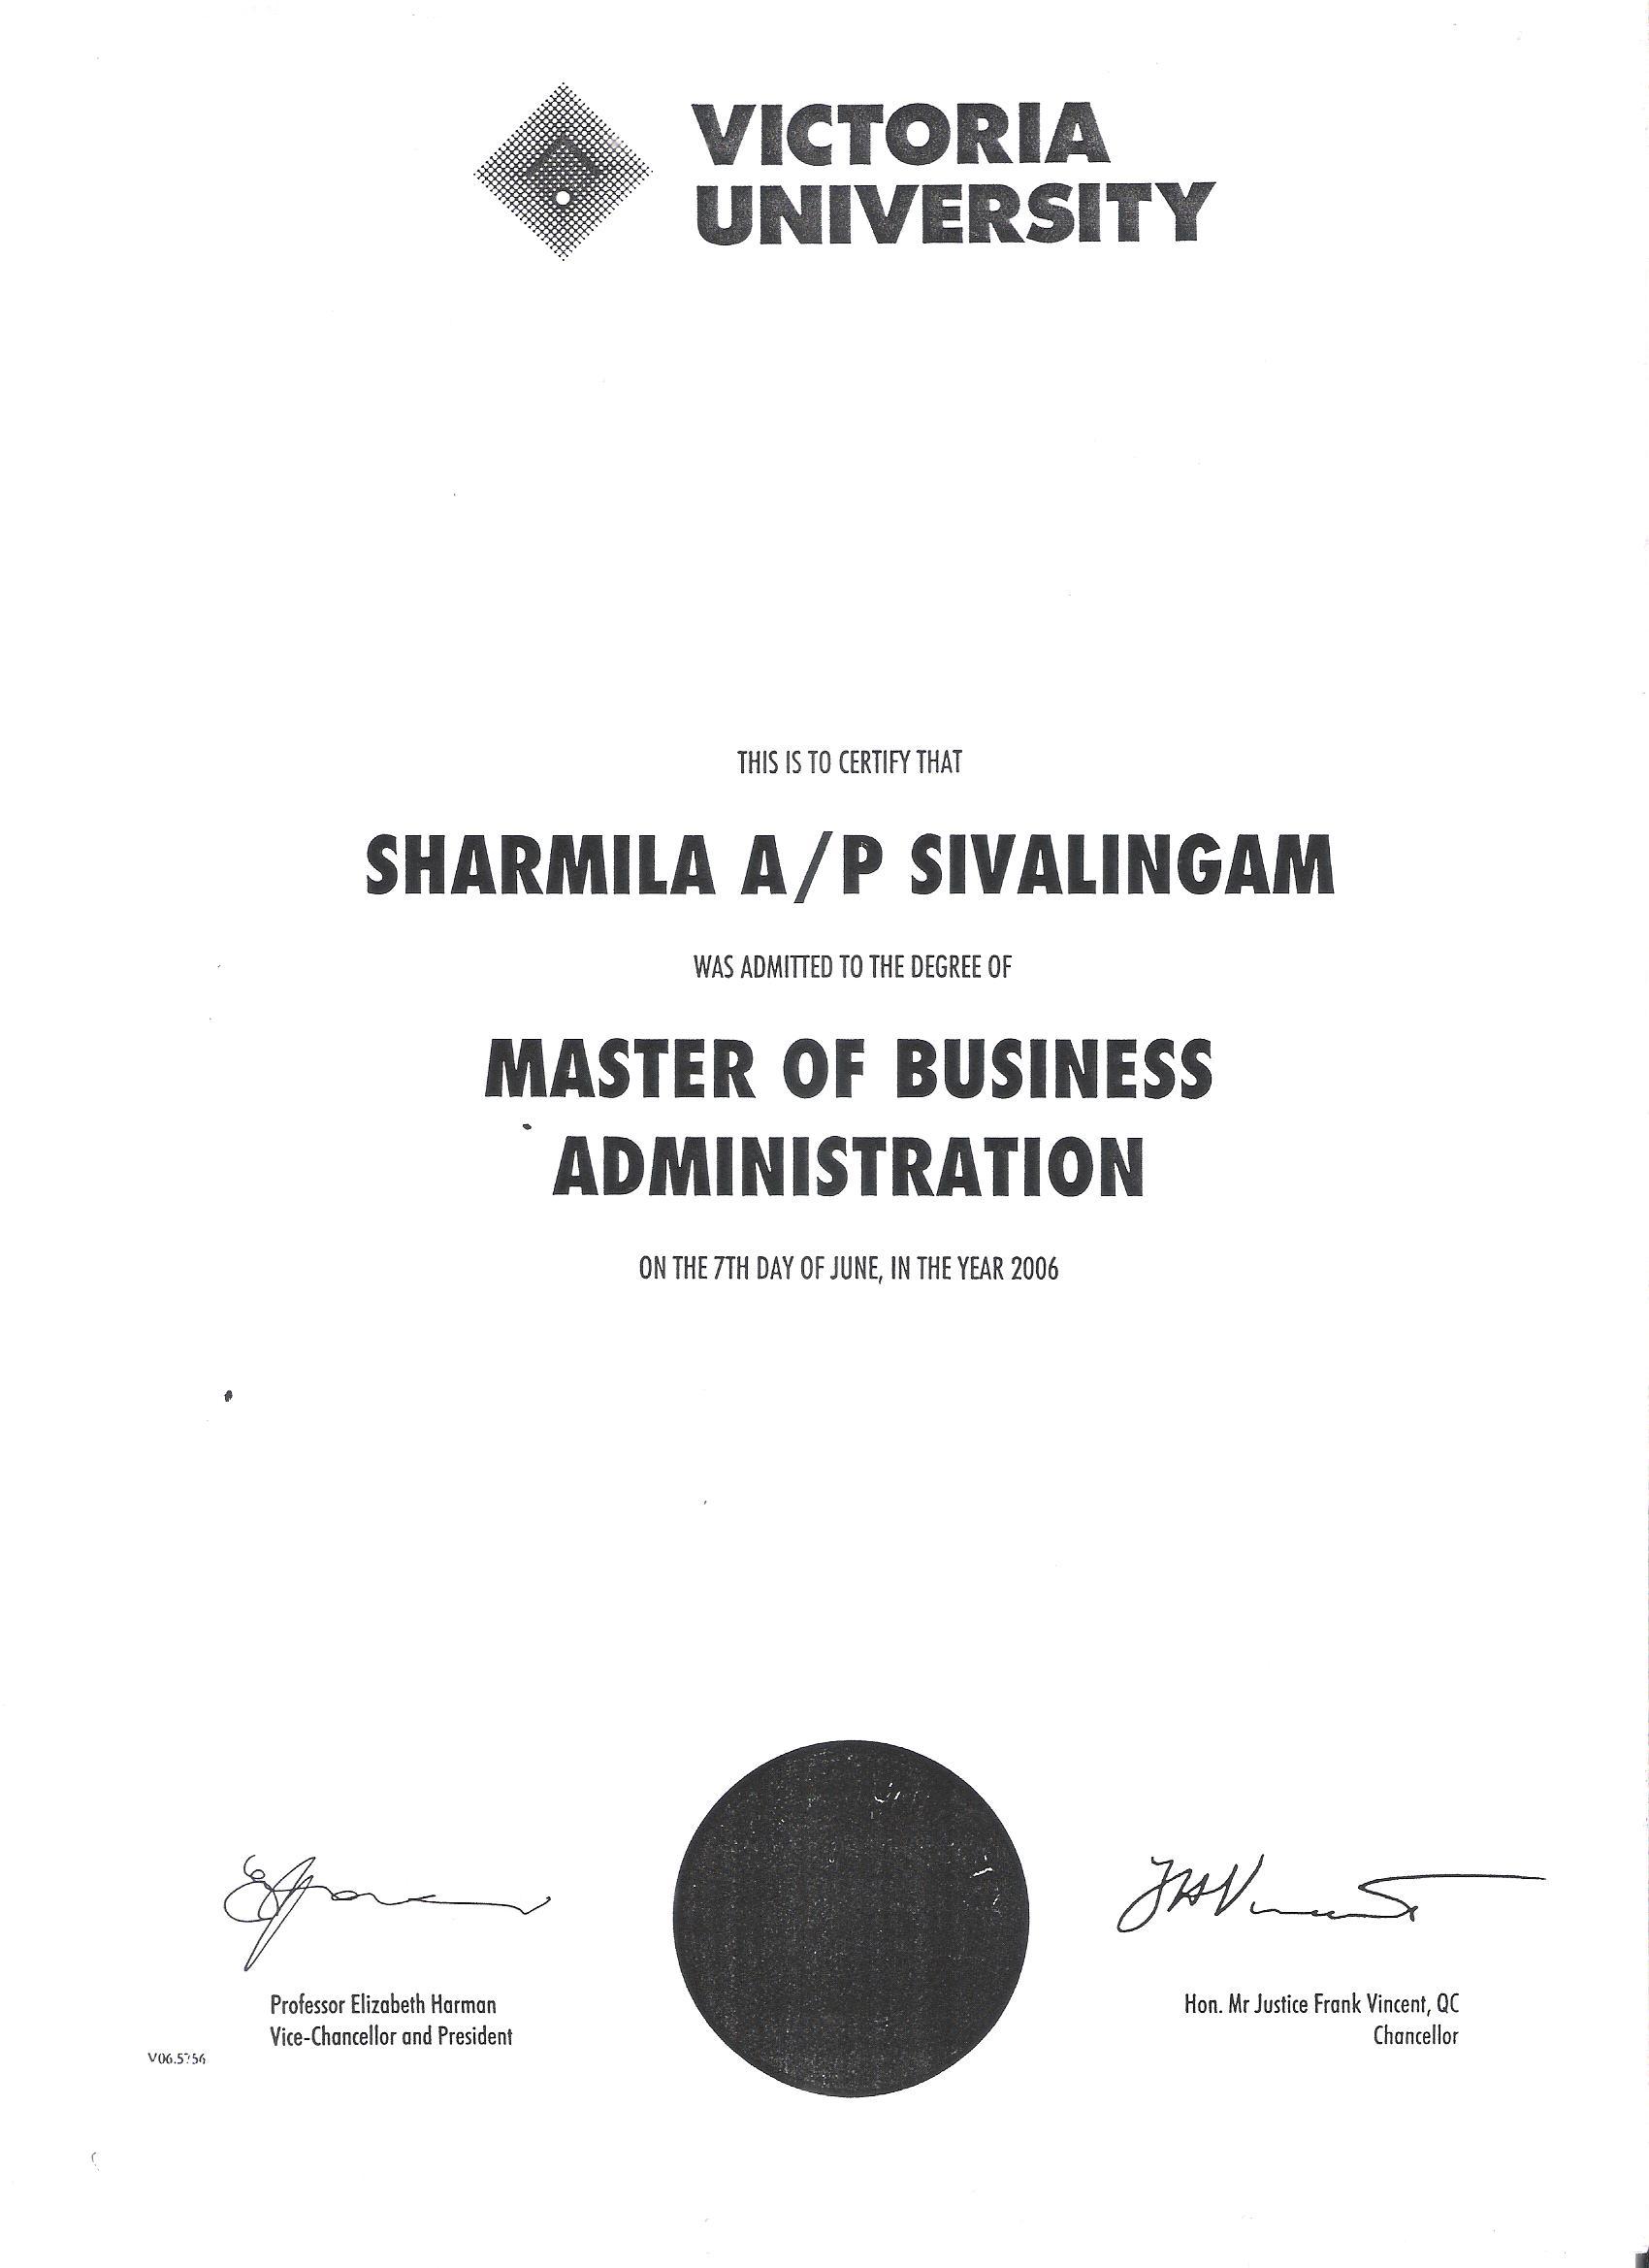 Certificates Reimagining Learning